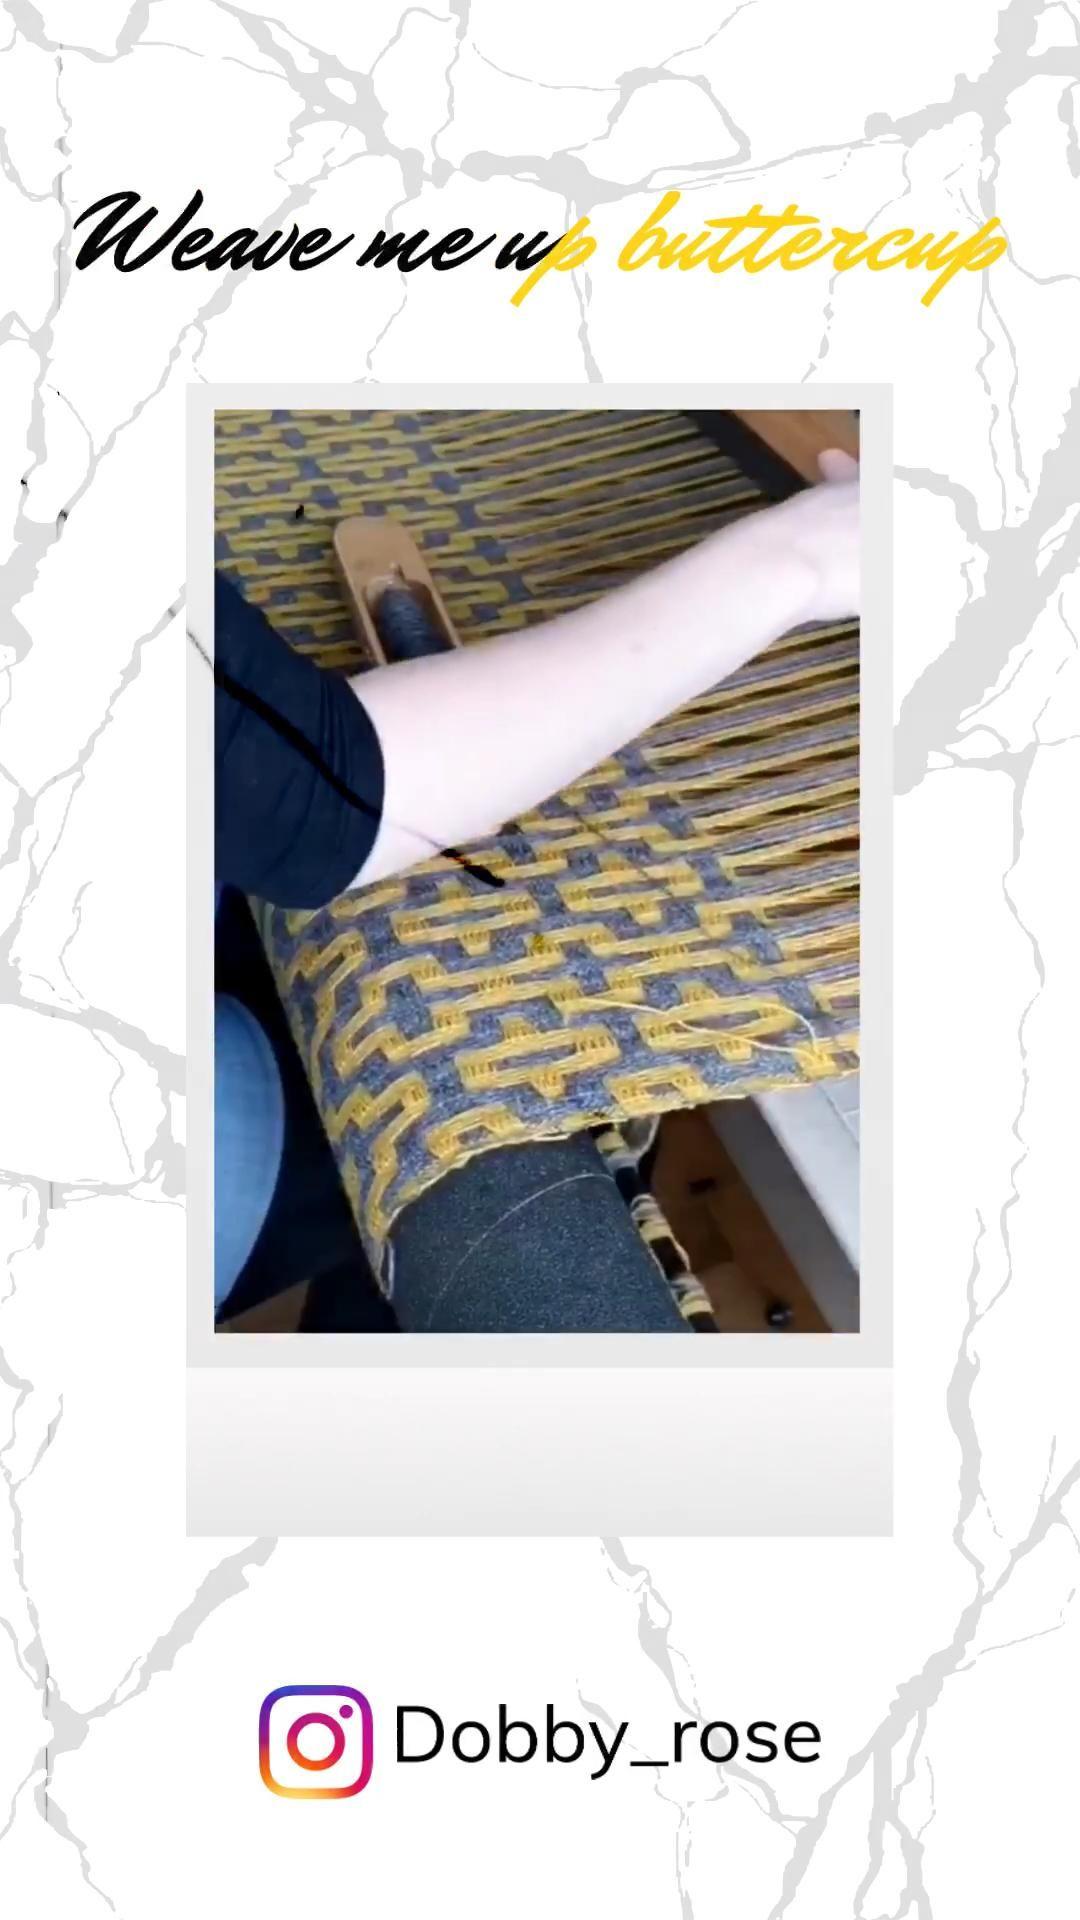 Handwoven designs   Luxury Homewares #weaving #weaversofinstagram #luxuryhomeinterior #workshops #learntoweave #diy #lampshades #cushions #textiledesign #textiles #texture #yellow #grey #madeinuk #surrey #inspiration #craftsman